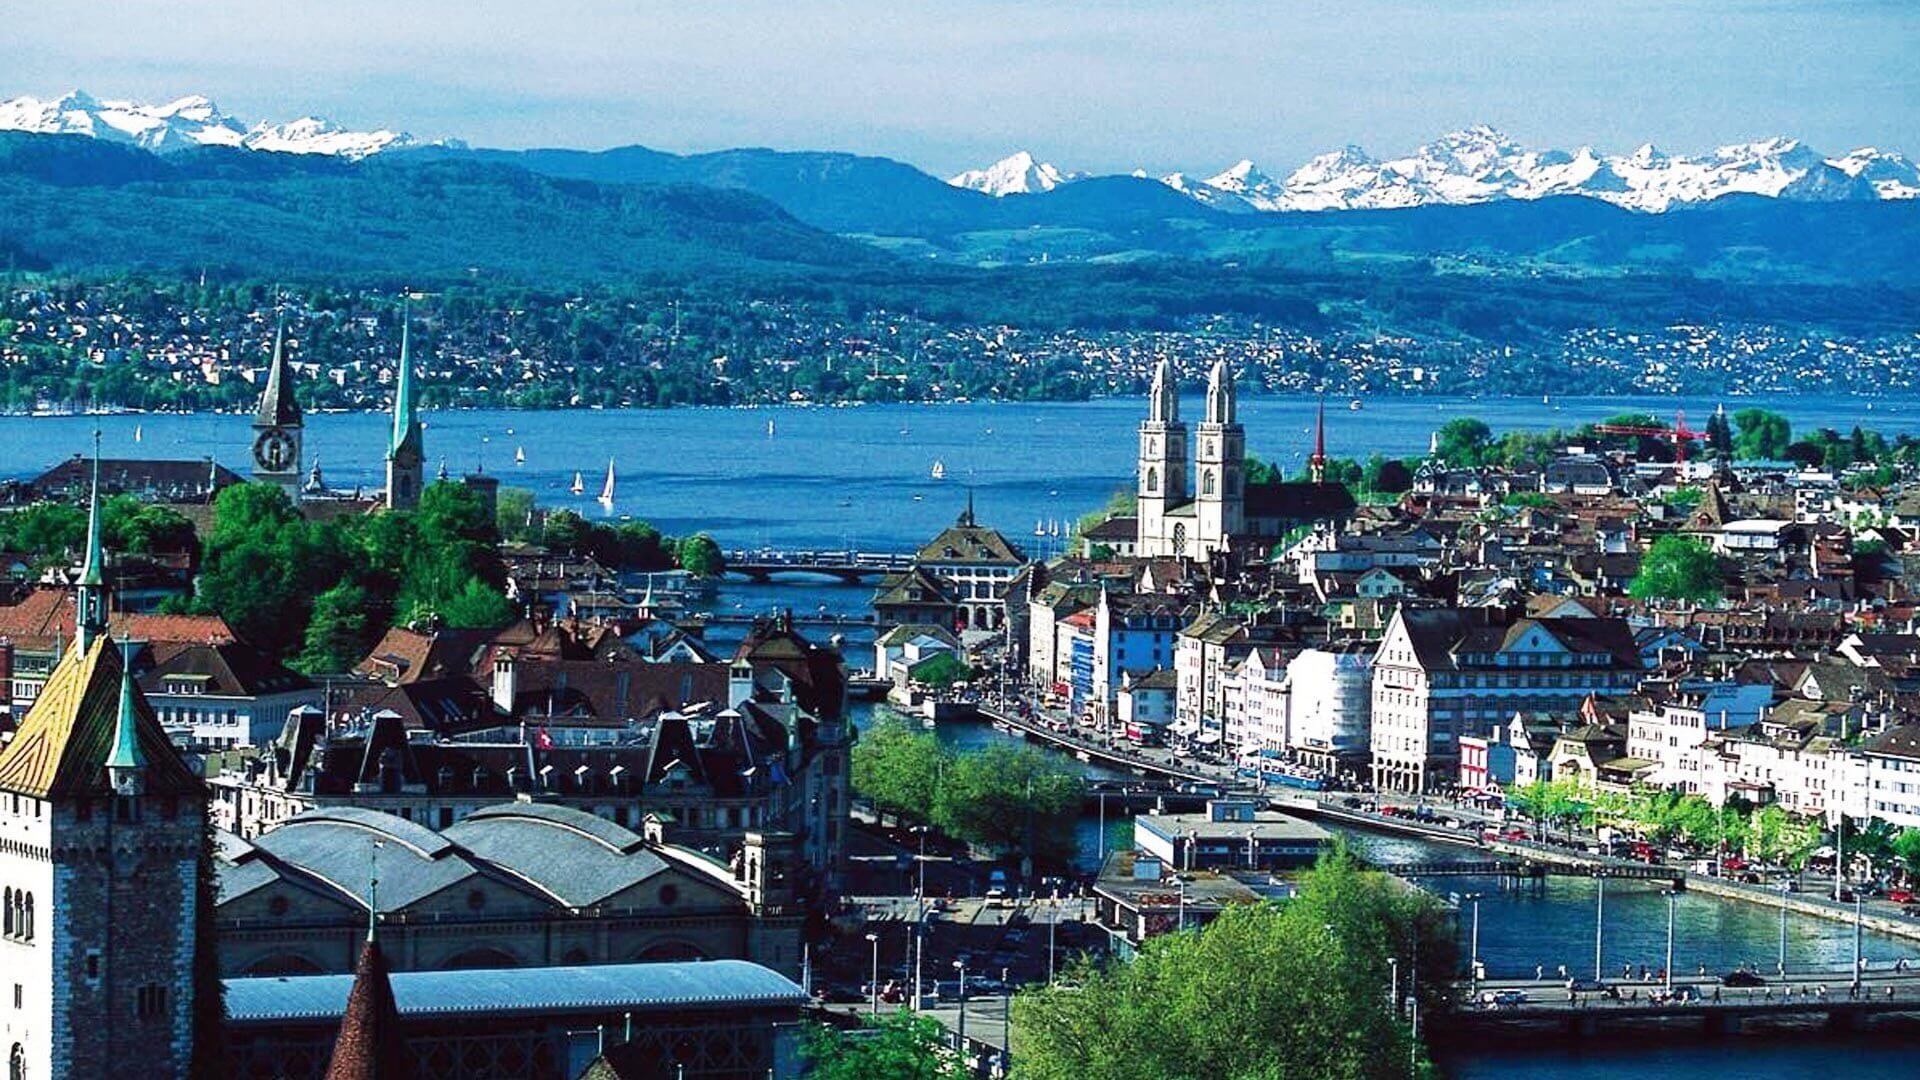 Cheap flights from Zurich